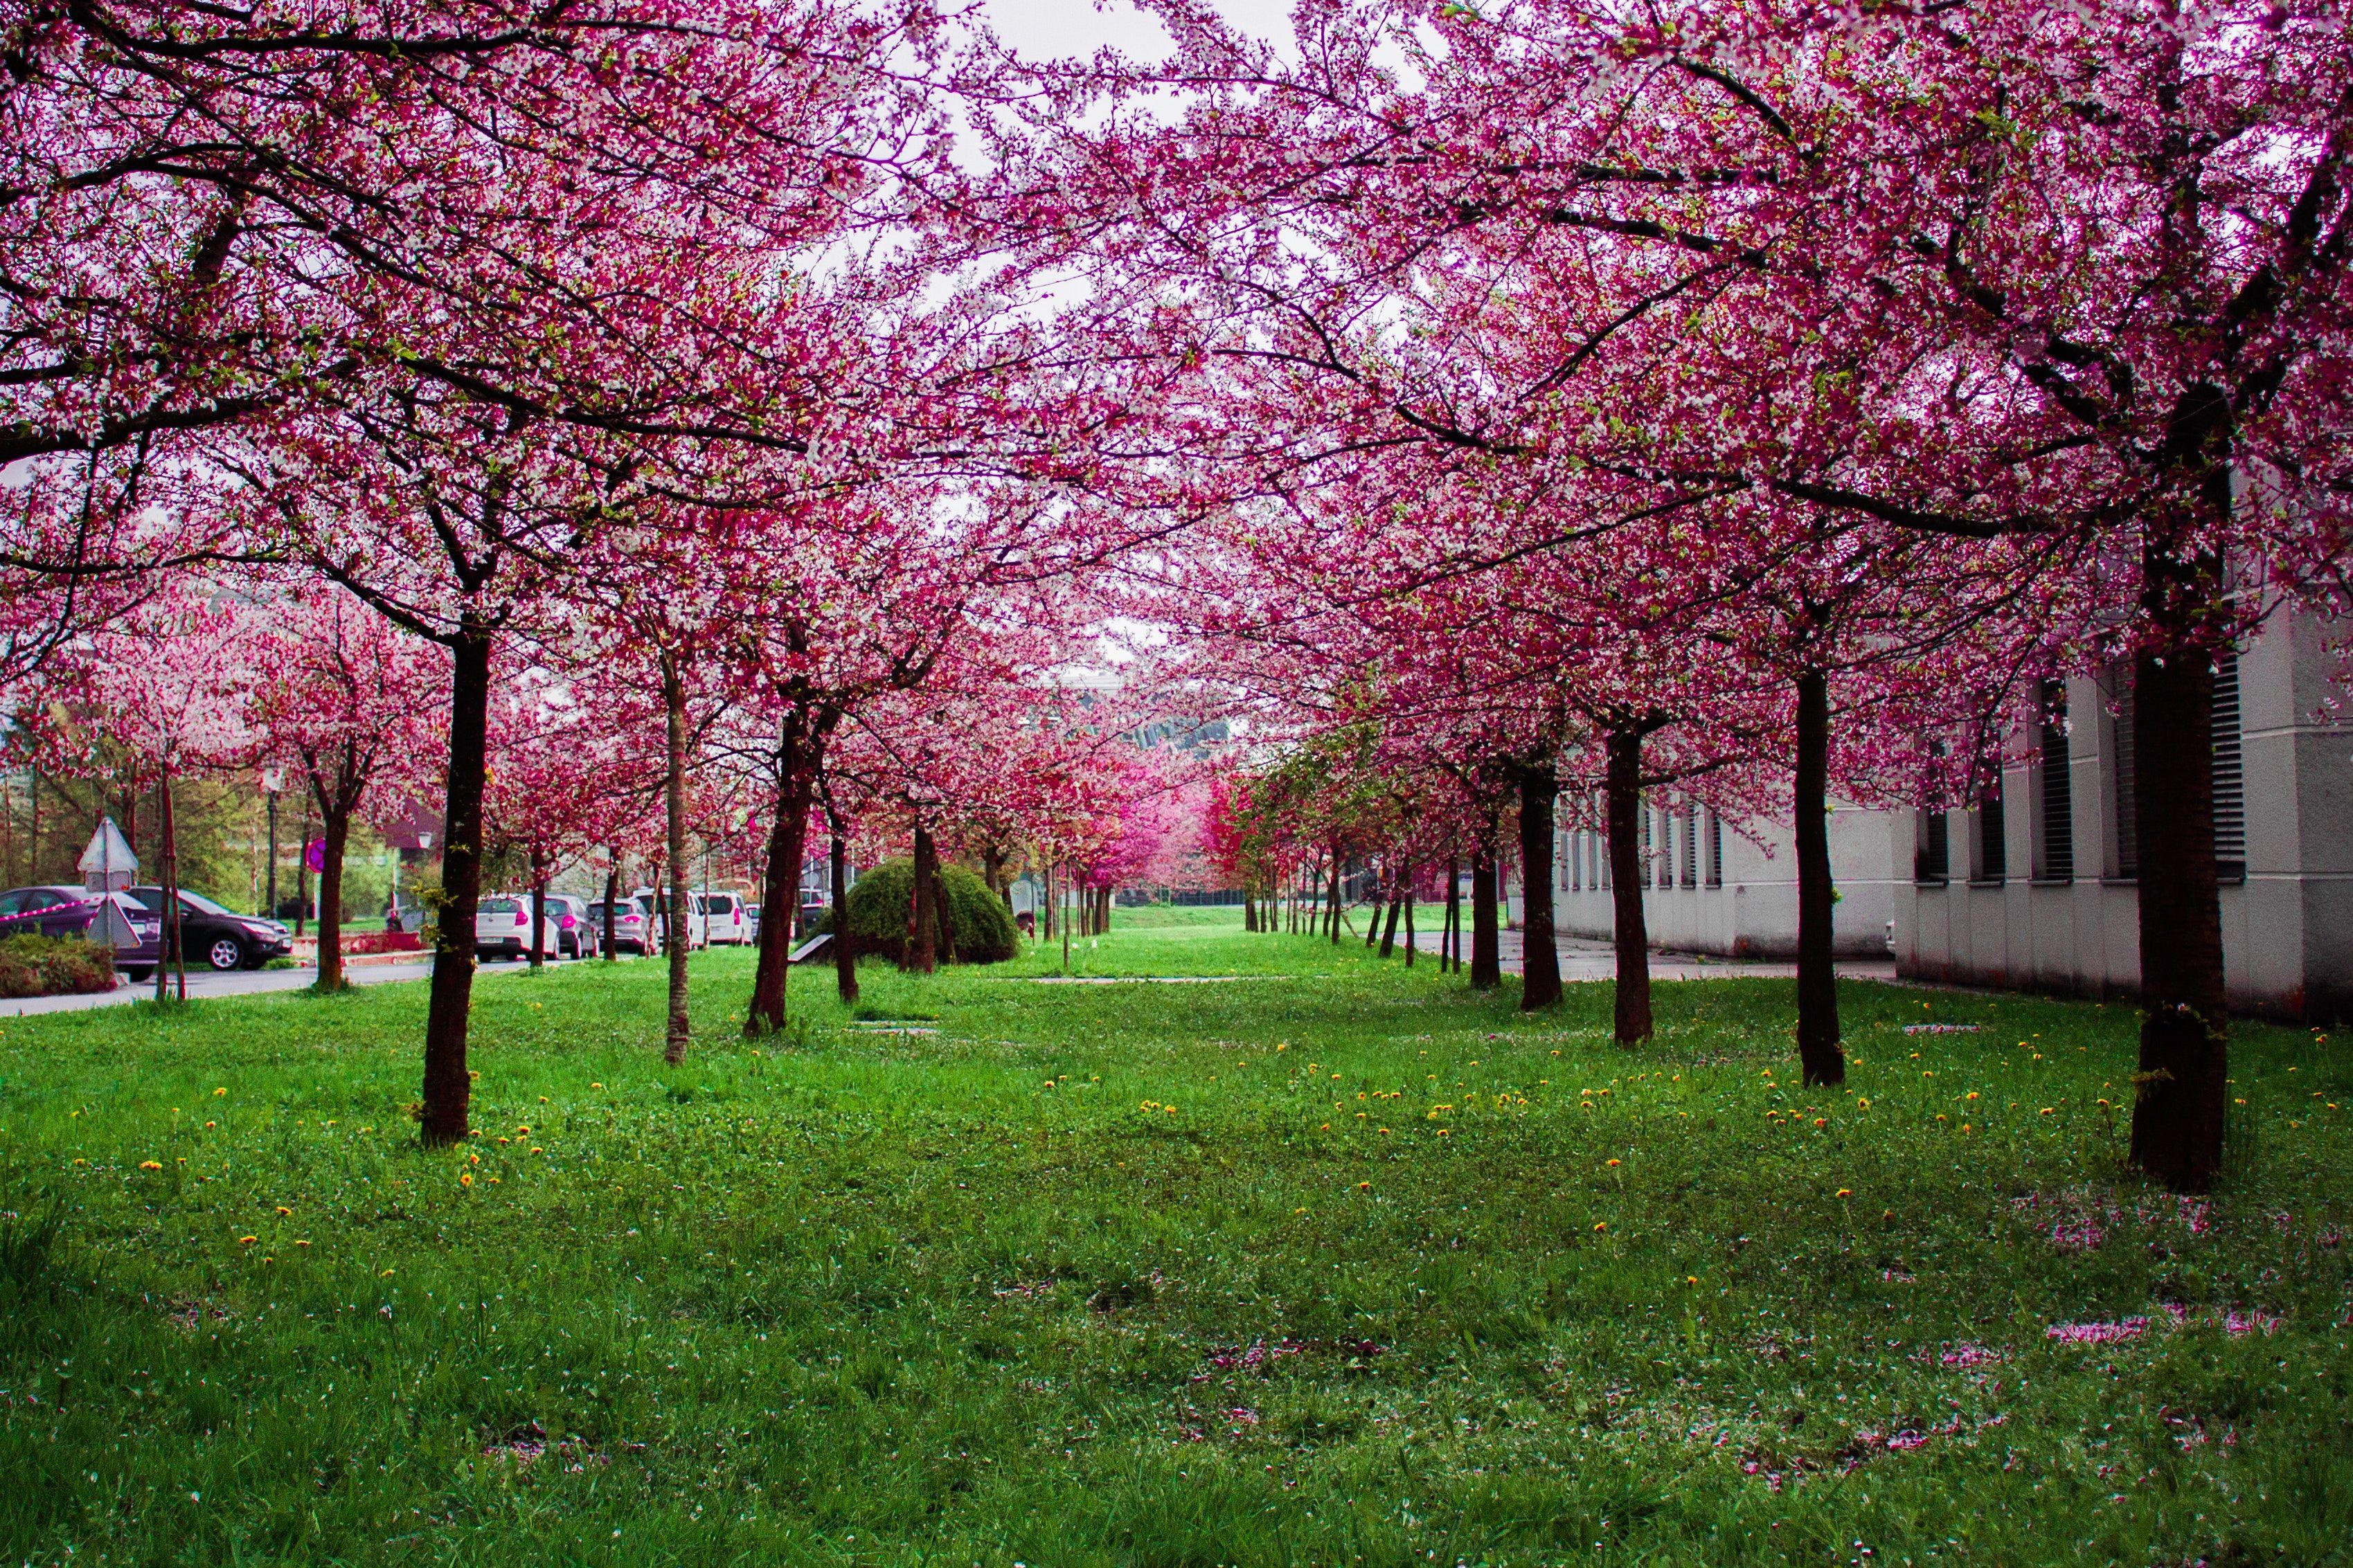 Pin By Karen Peebles On Beautiful Nature Flowering Trees Flowering Cherry Tree Pink Trees